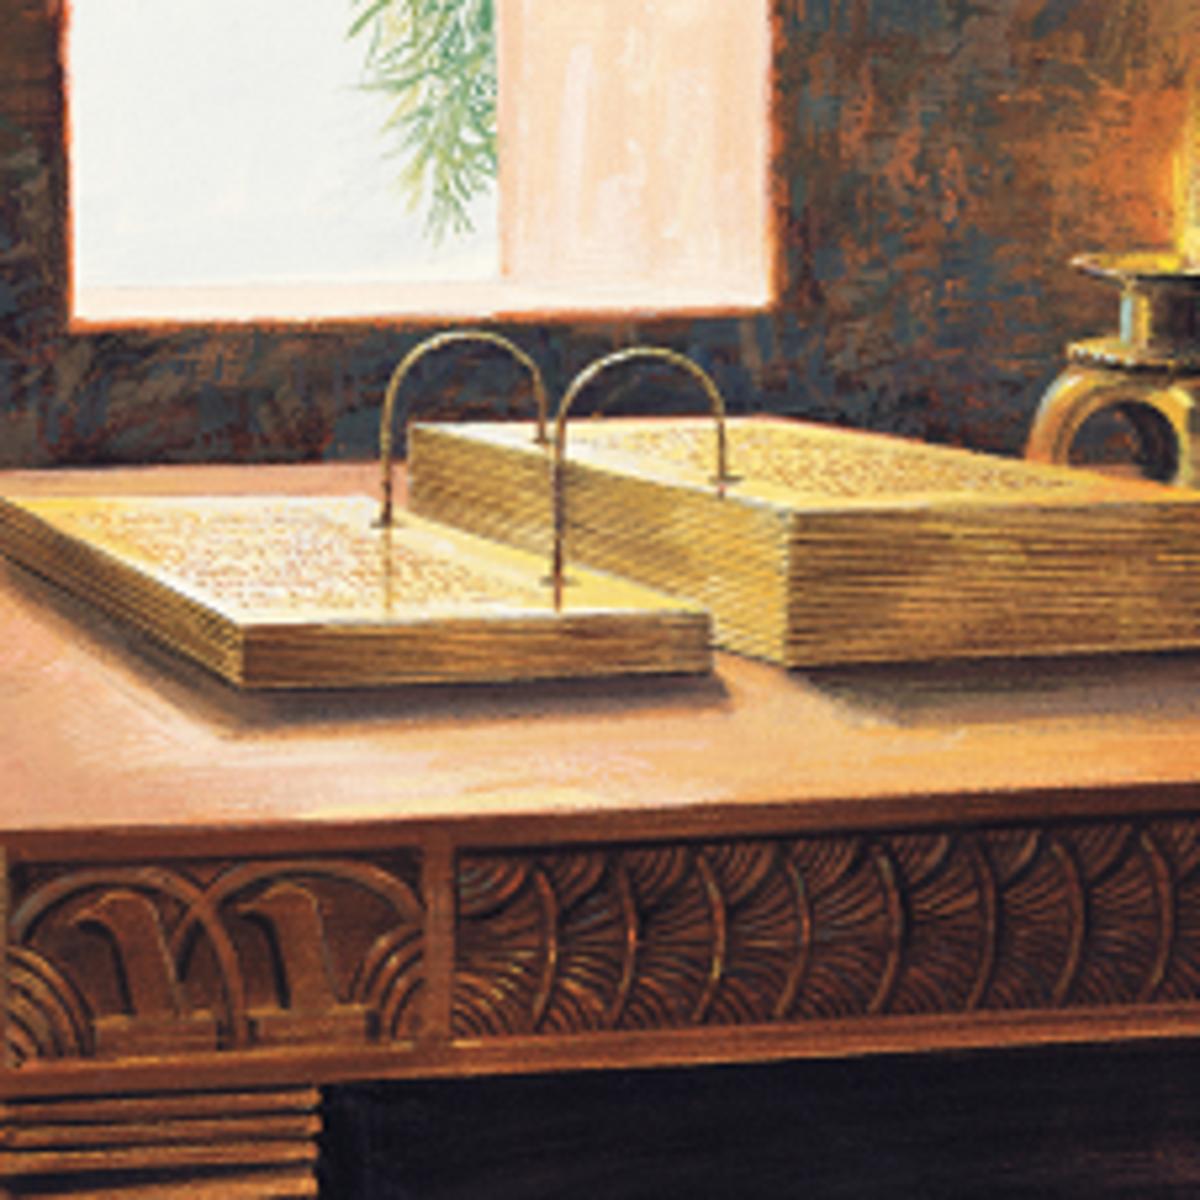 Book of Mormon Gold Plates